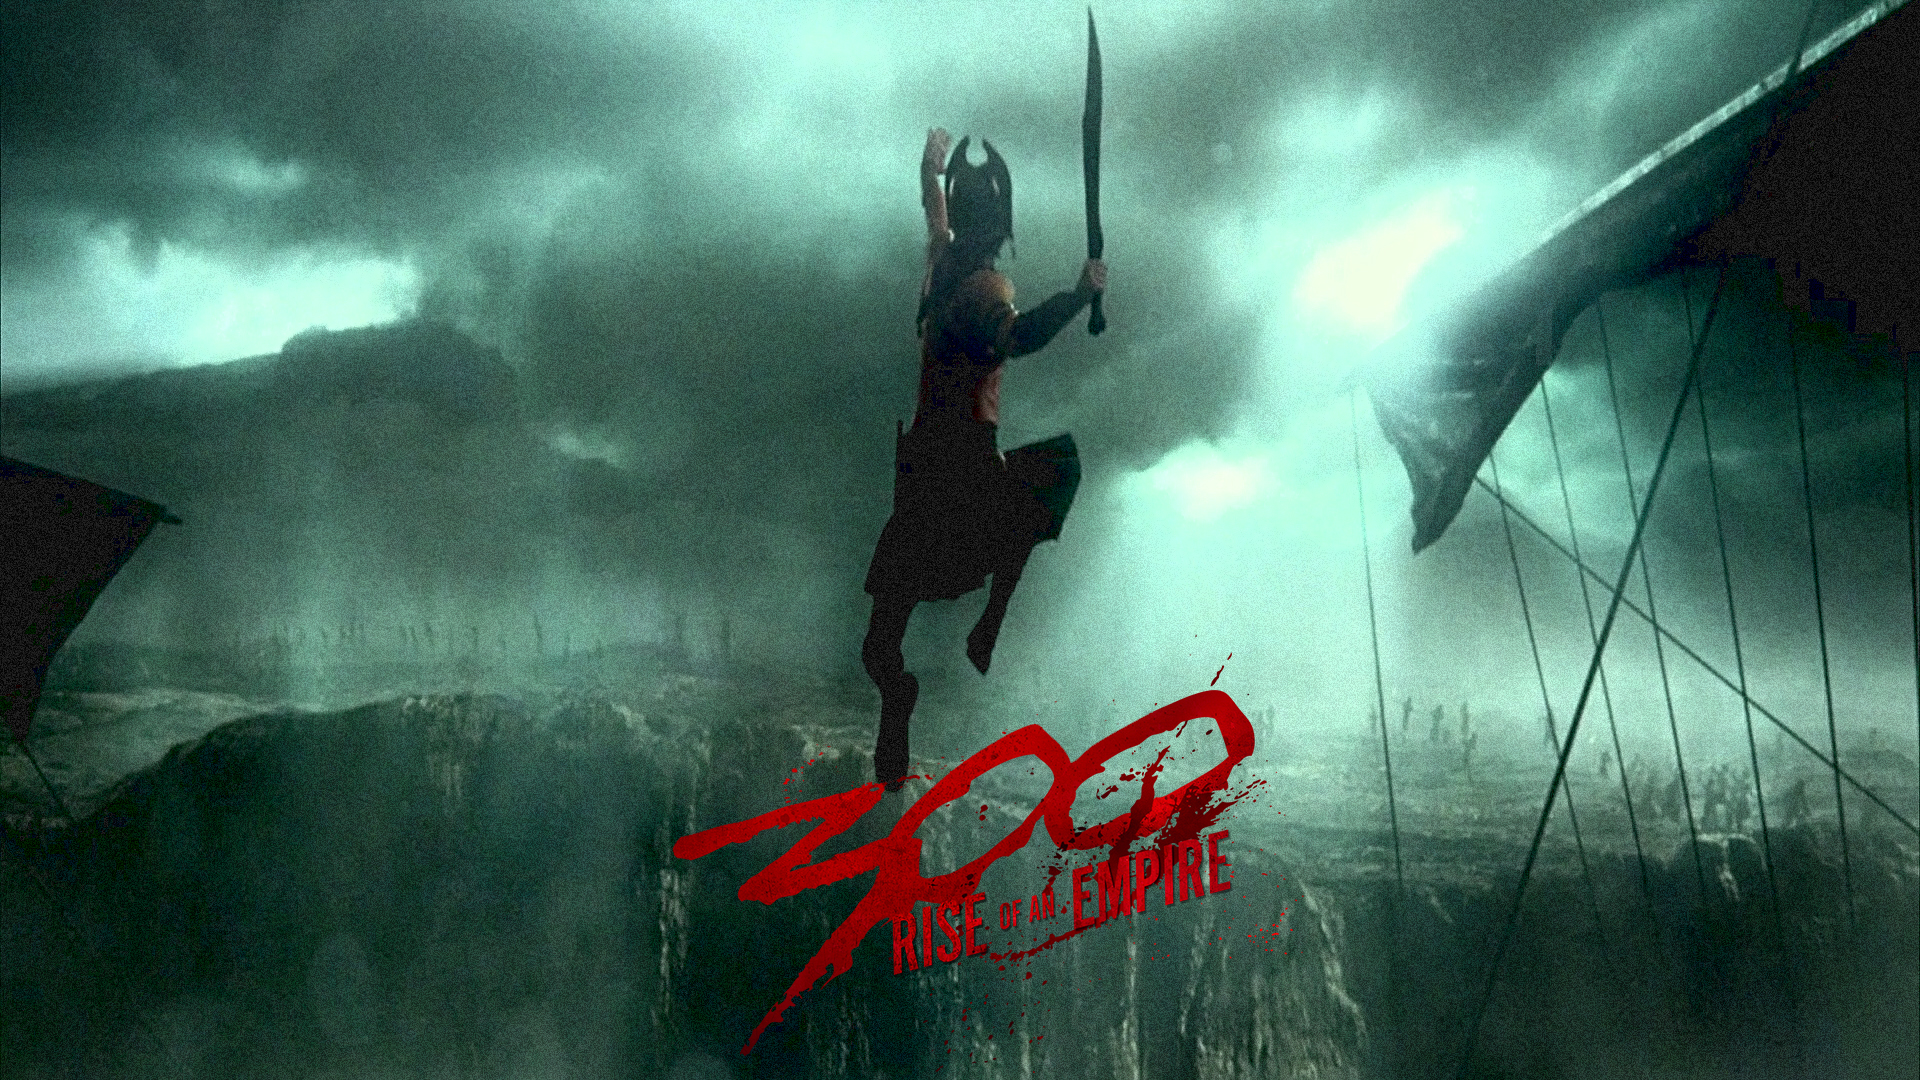 300 RISE OF AN EMPIRE action drama war fantasy warrior ...